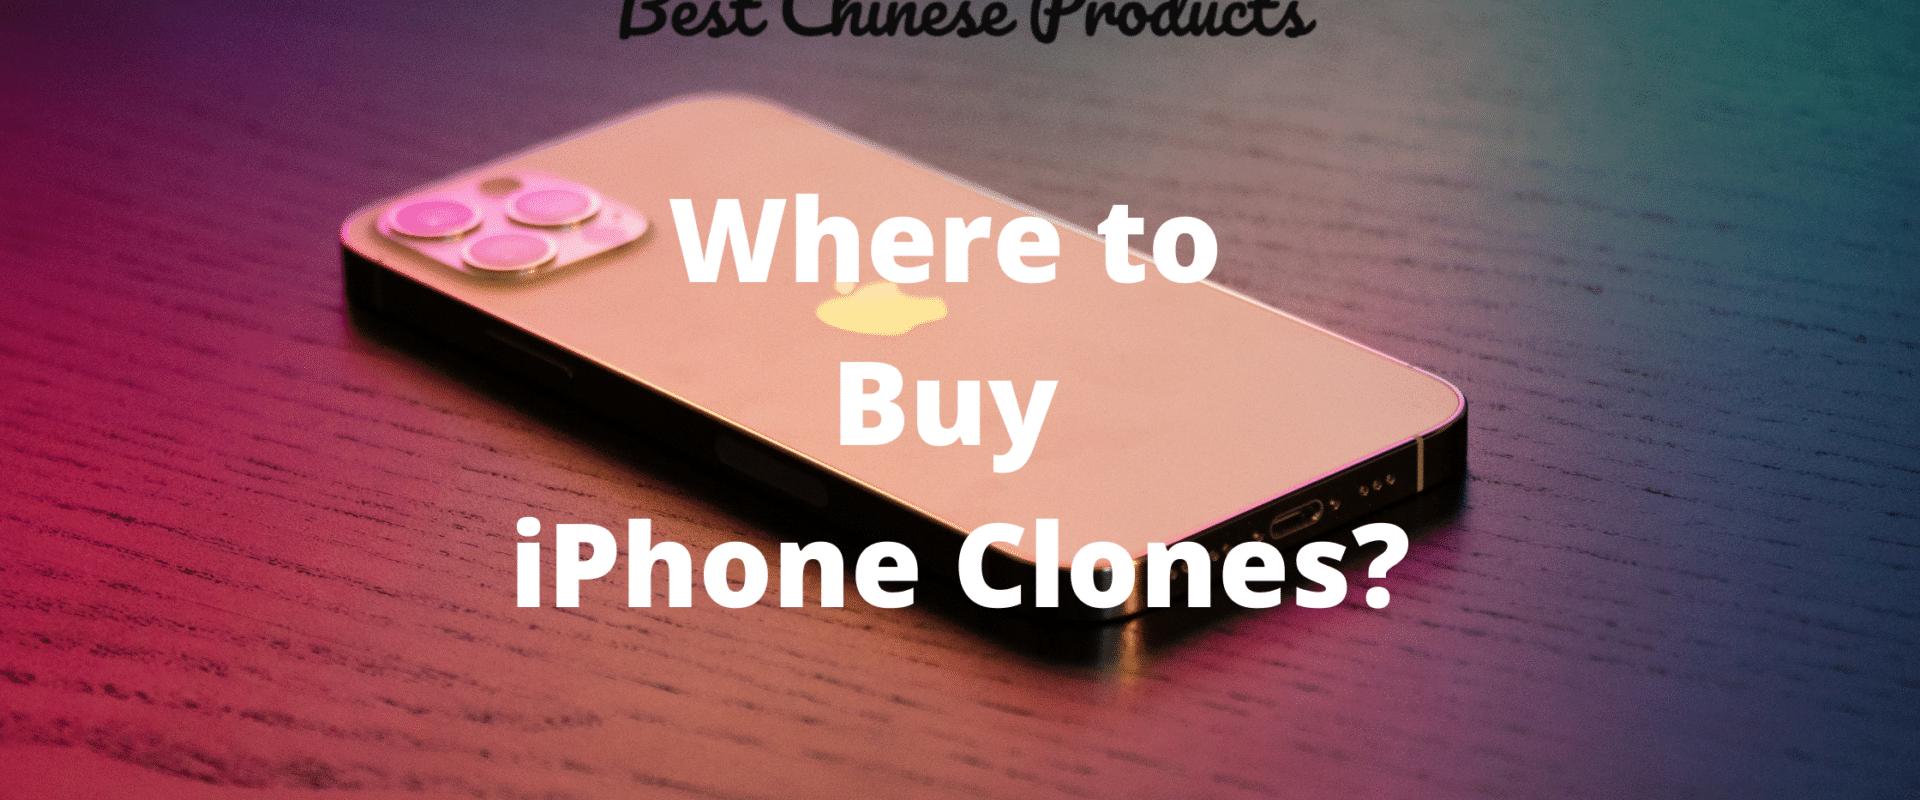 Where to Buy fake iPhone Clones